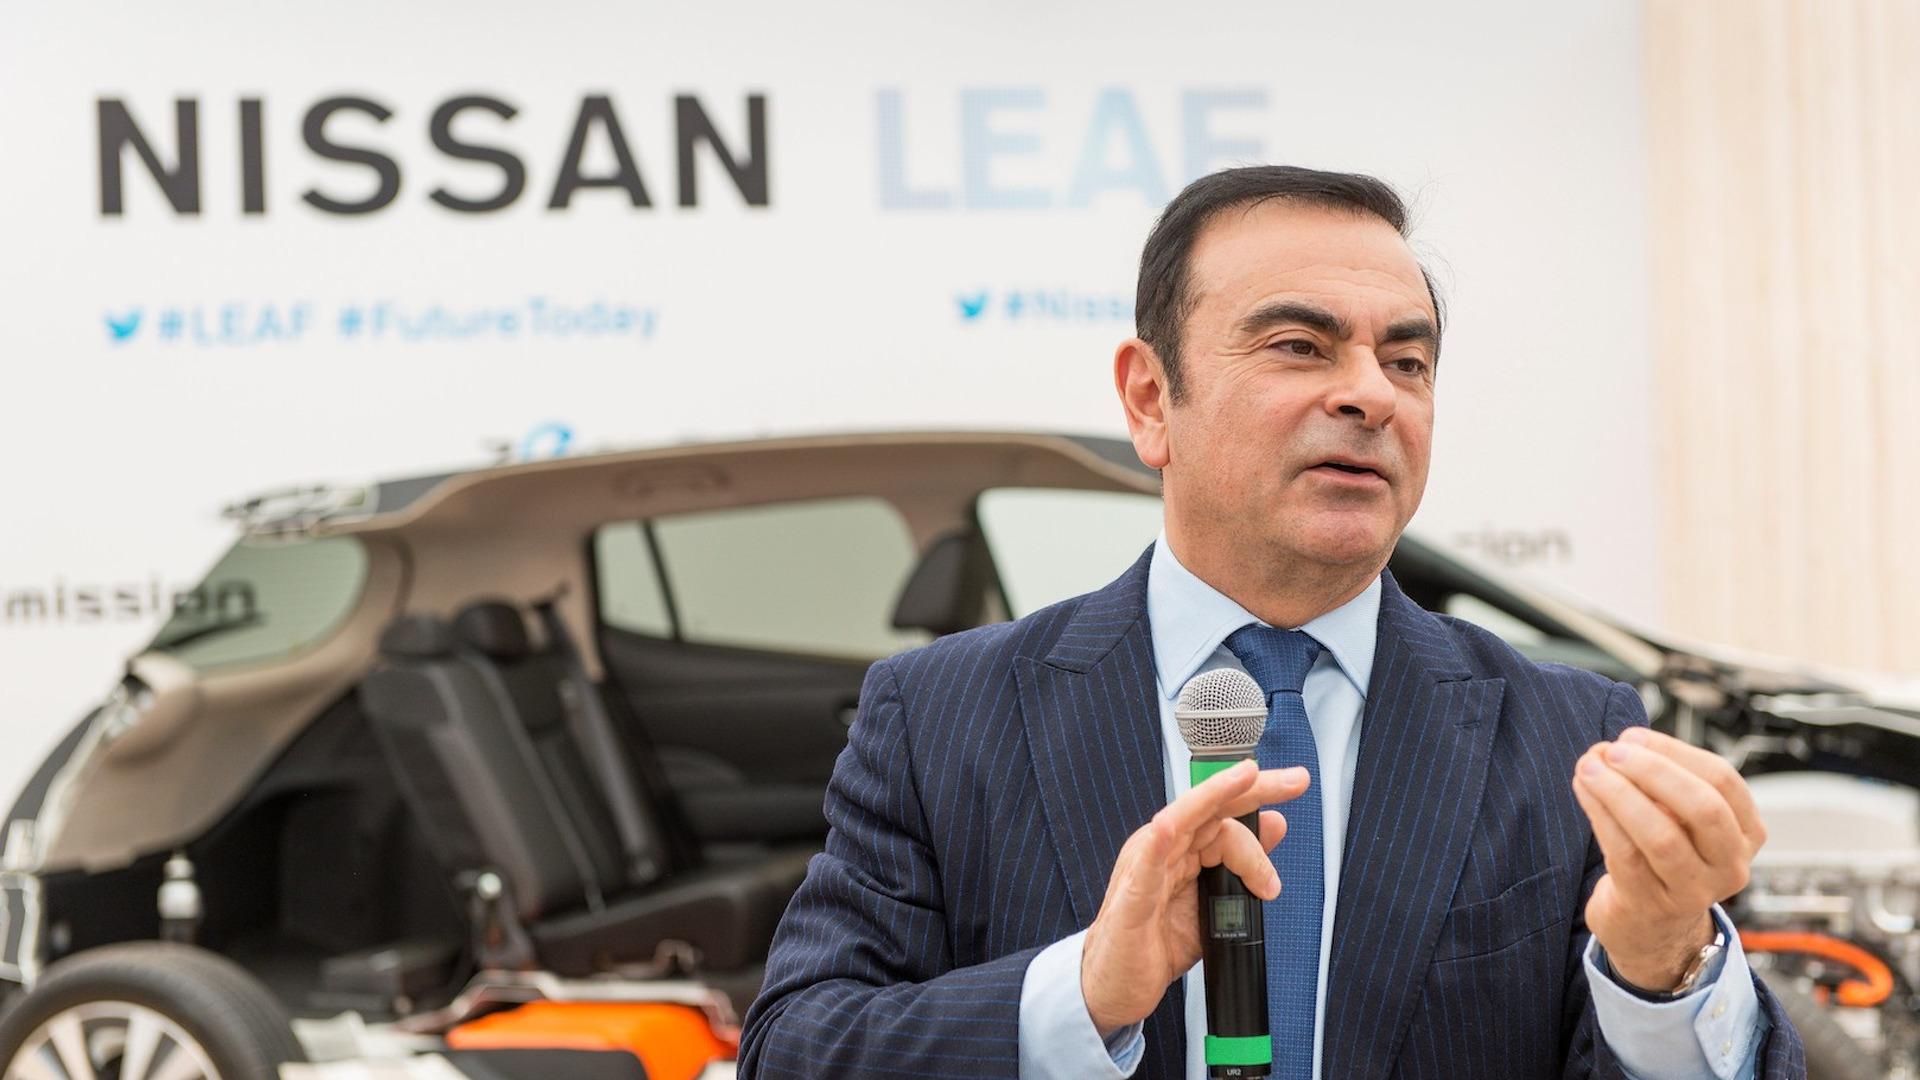 Quem tramou Carlos Ghosn?